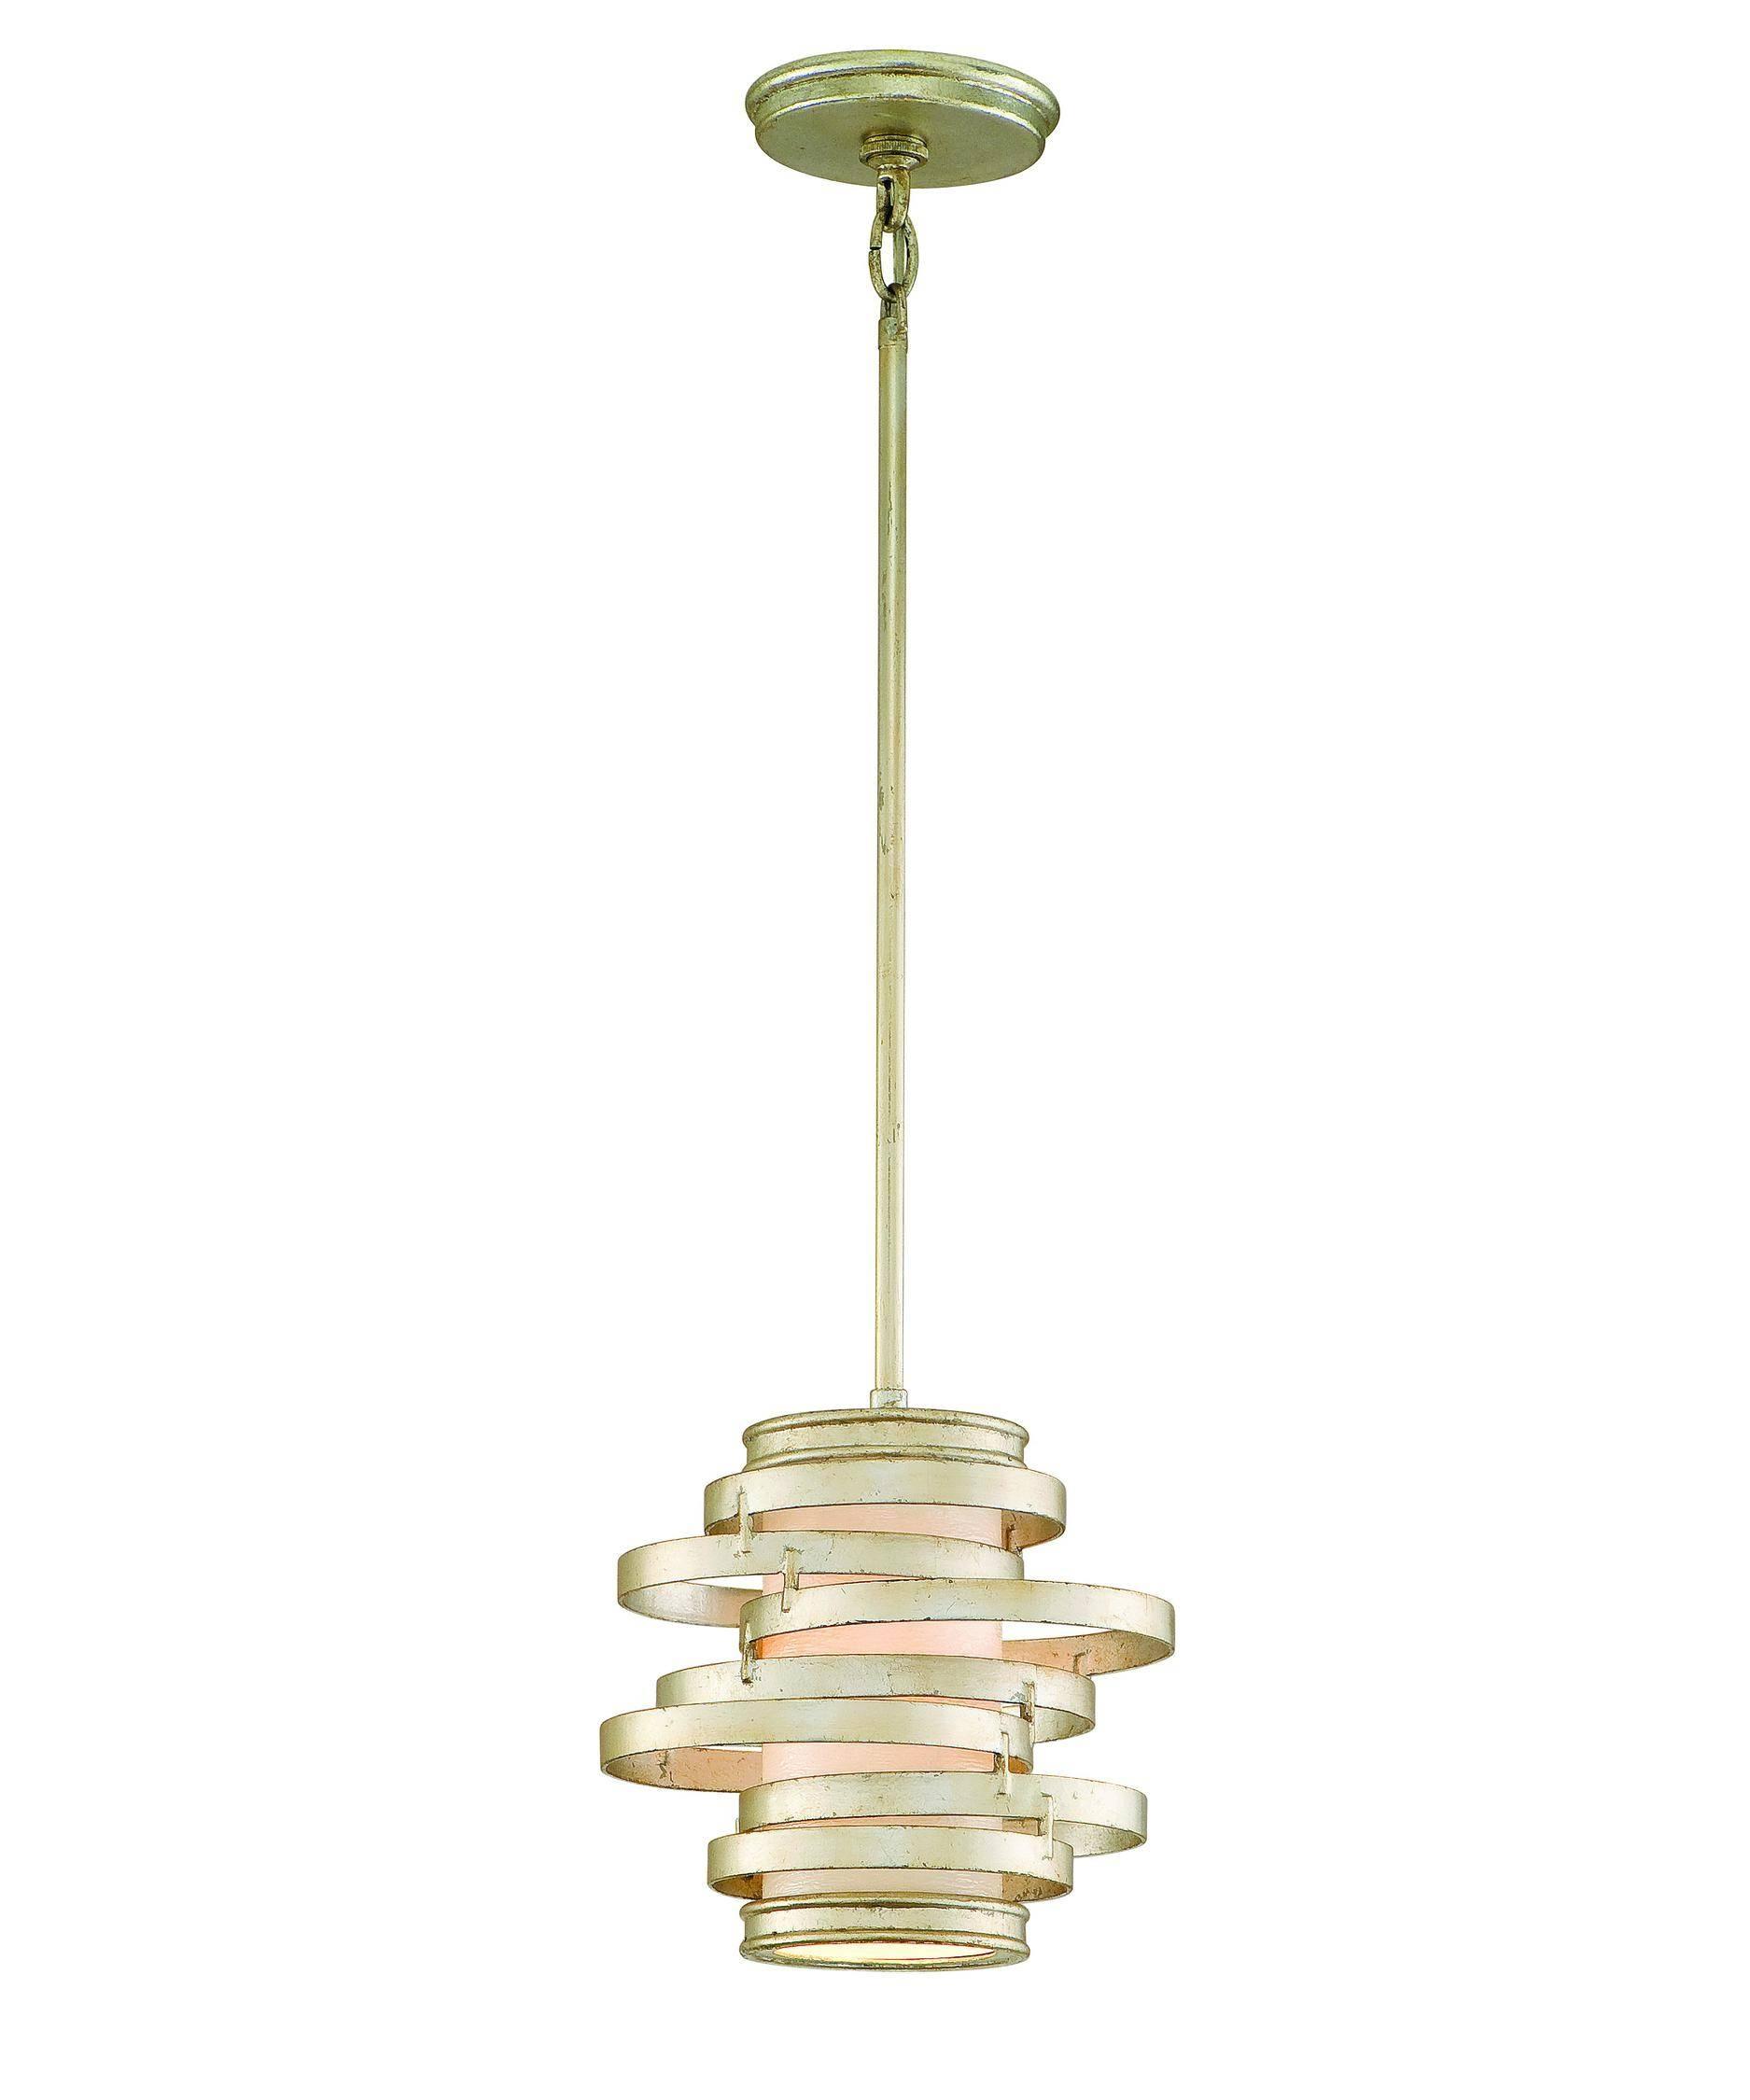 Corbett Lighting Ve-41 Vertigo 14 Inch Wide 1 Light Mini Pendant with regard to Corbett Vertigo Pendant Lights (Image 8 of 15)